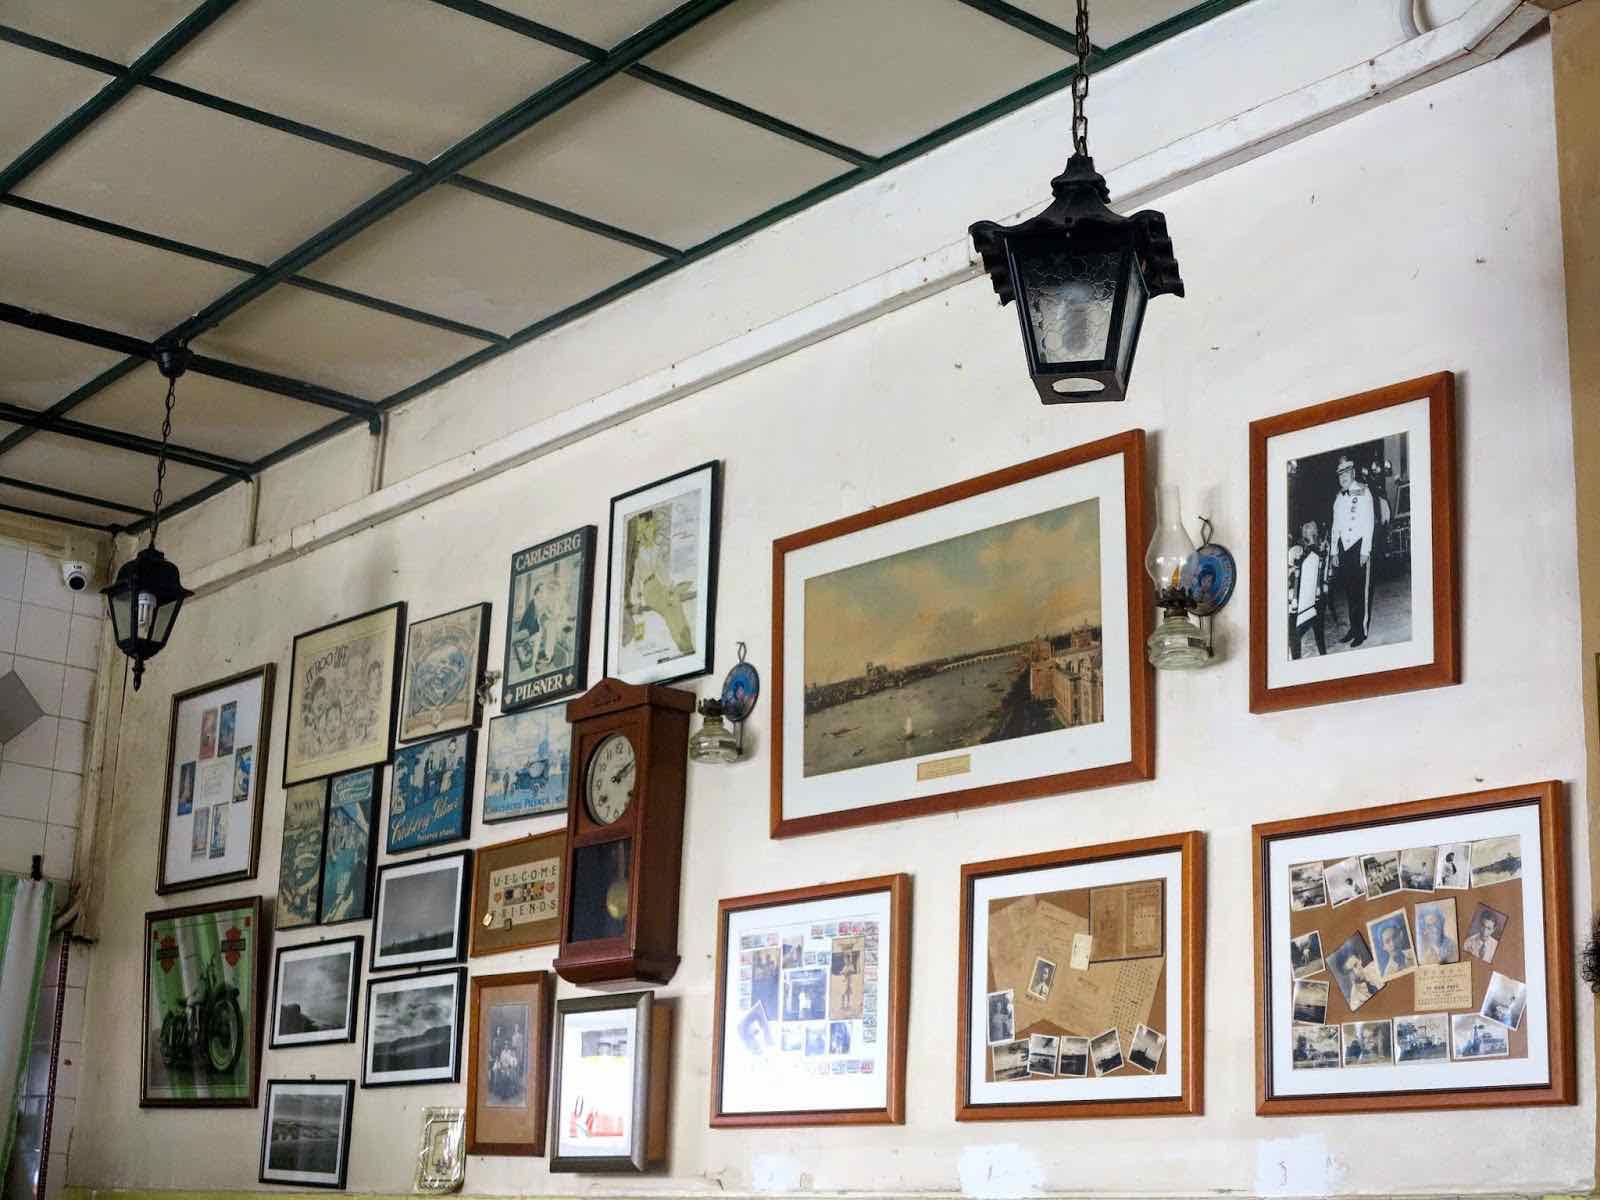 IT Roo Cafe Johor Bahru Malaysia - AspirantSG